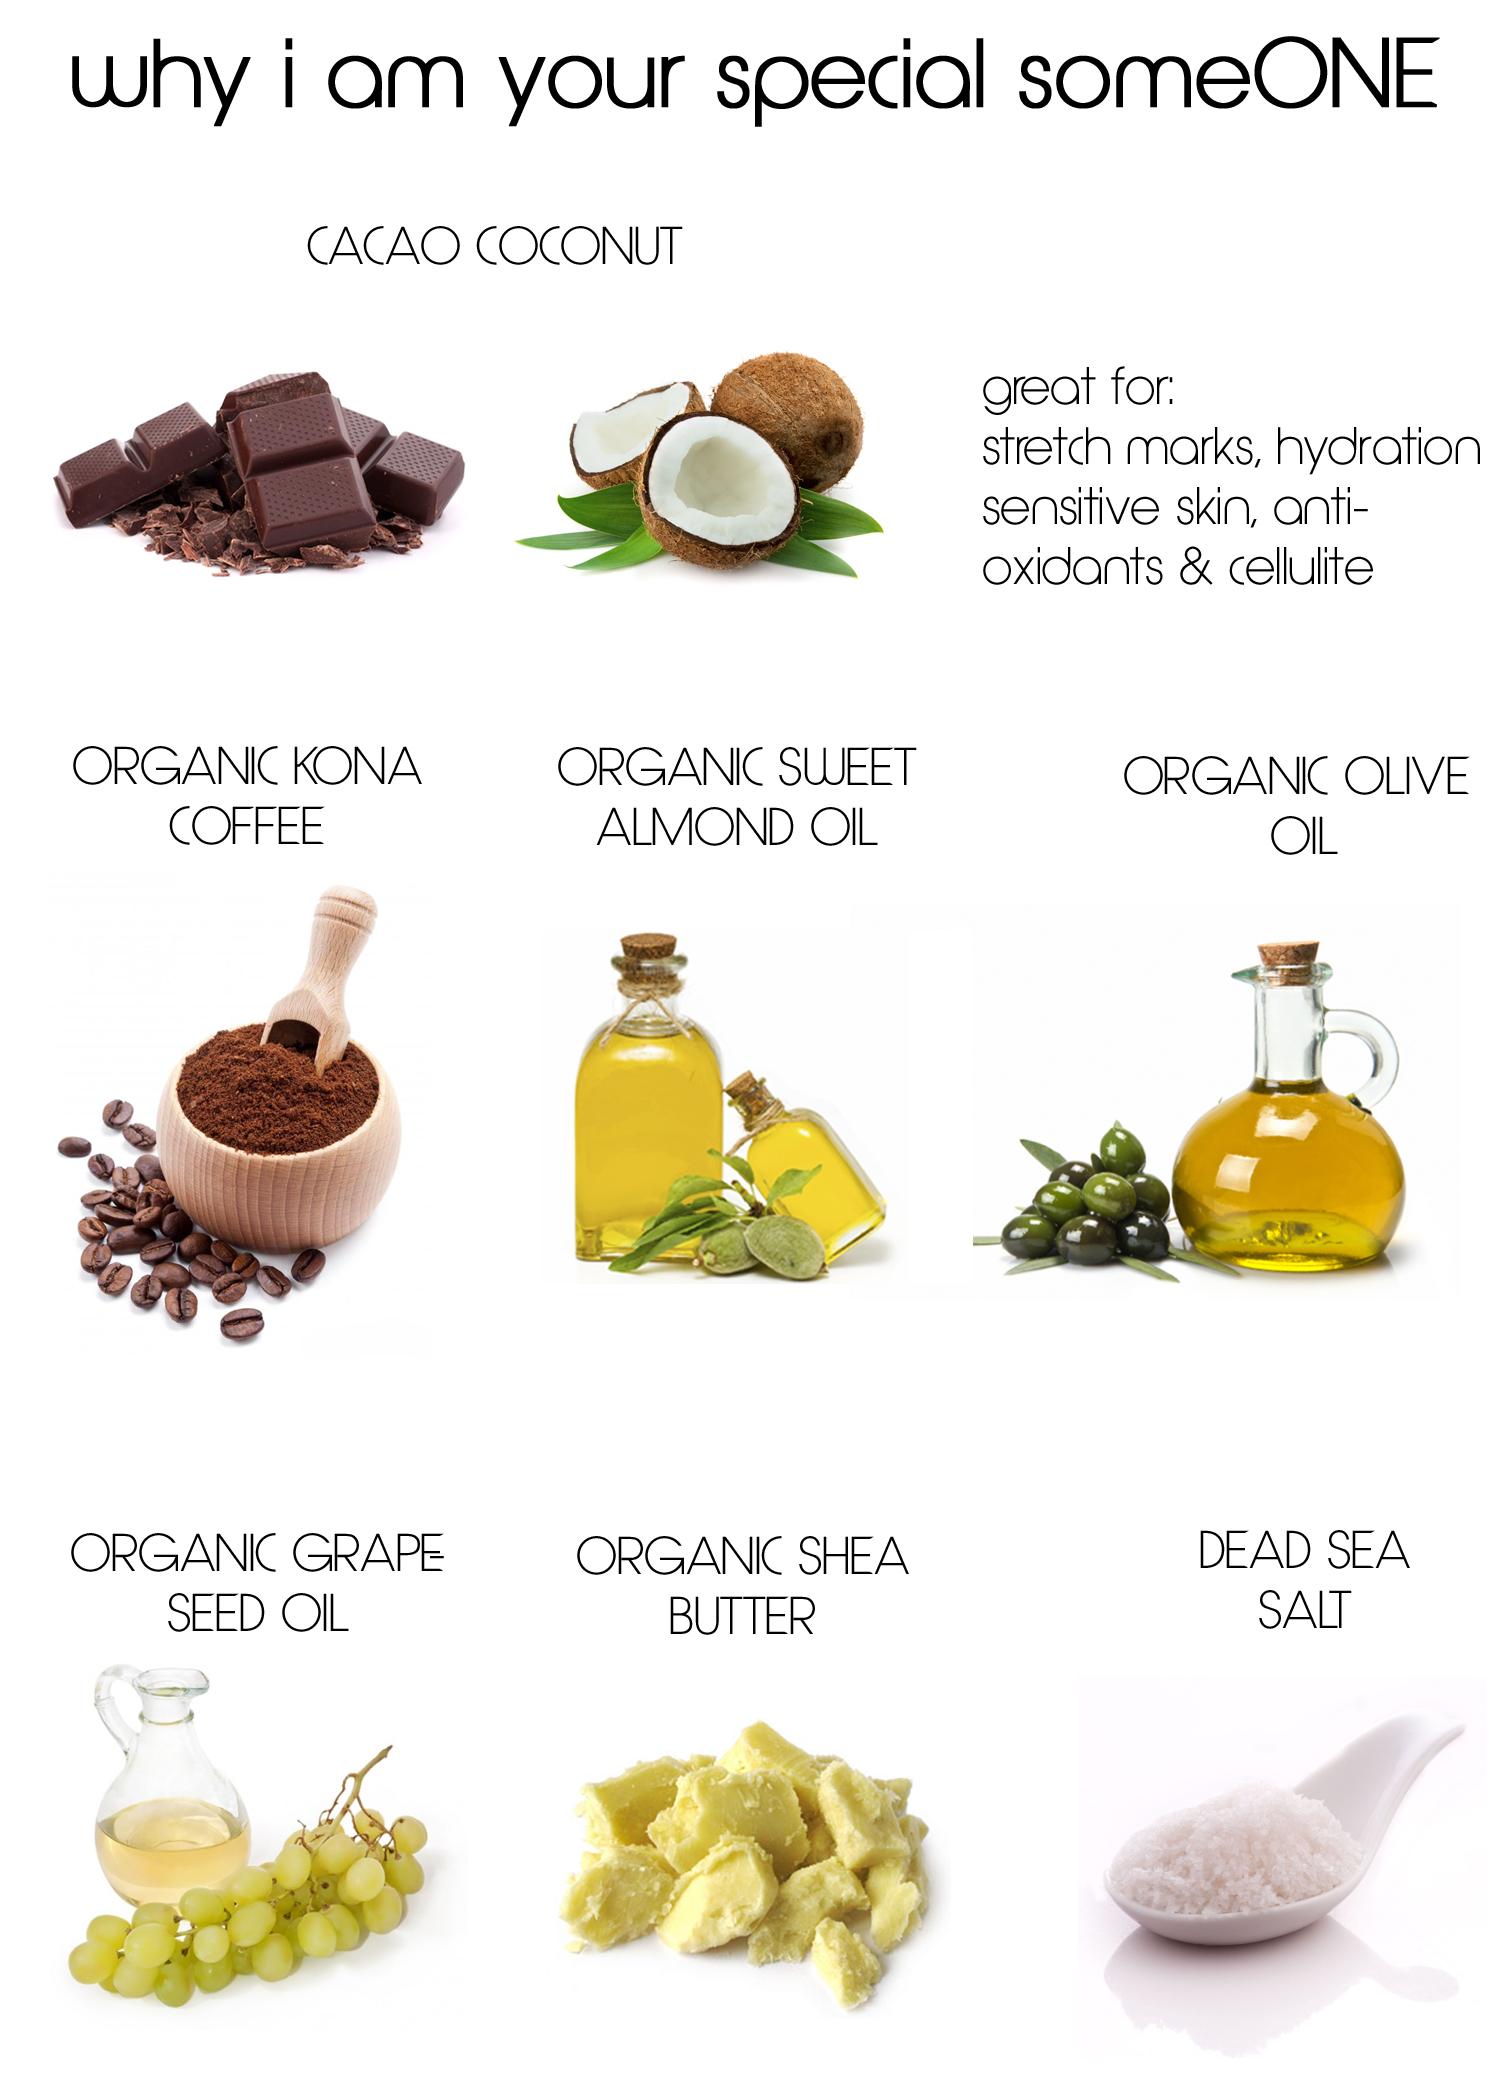 cacao-coconut-ingredients.jpg